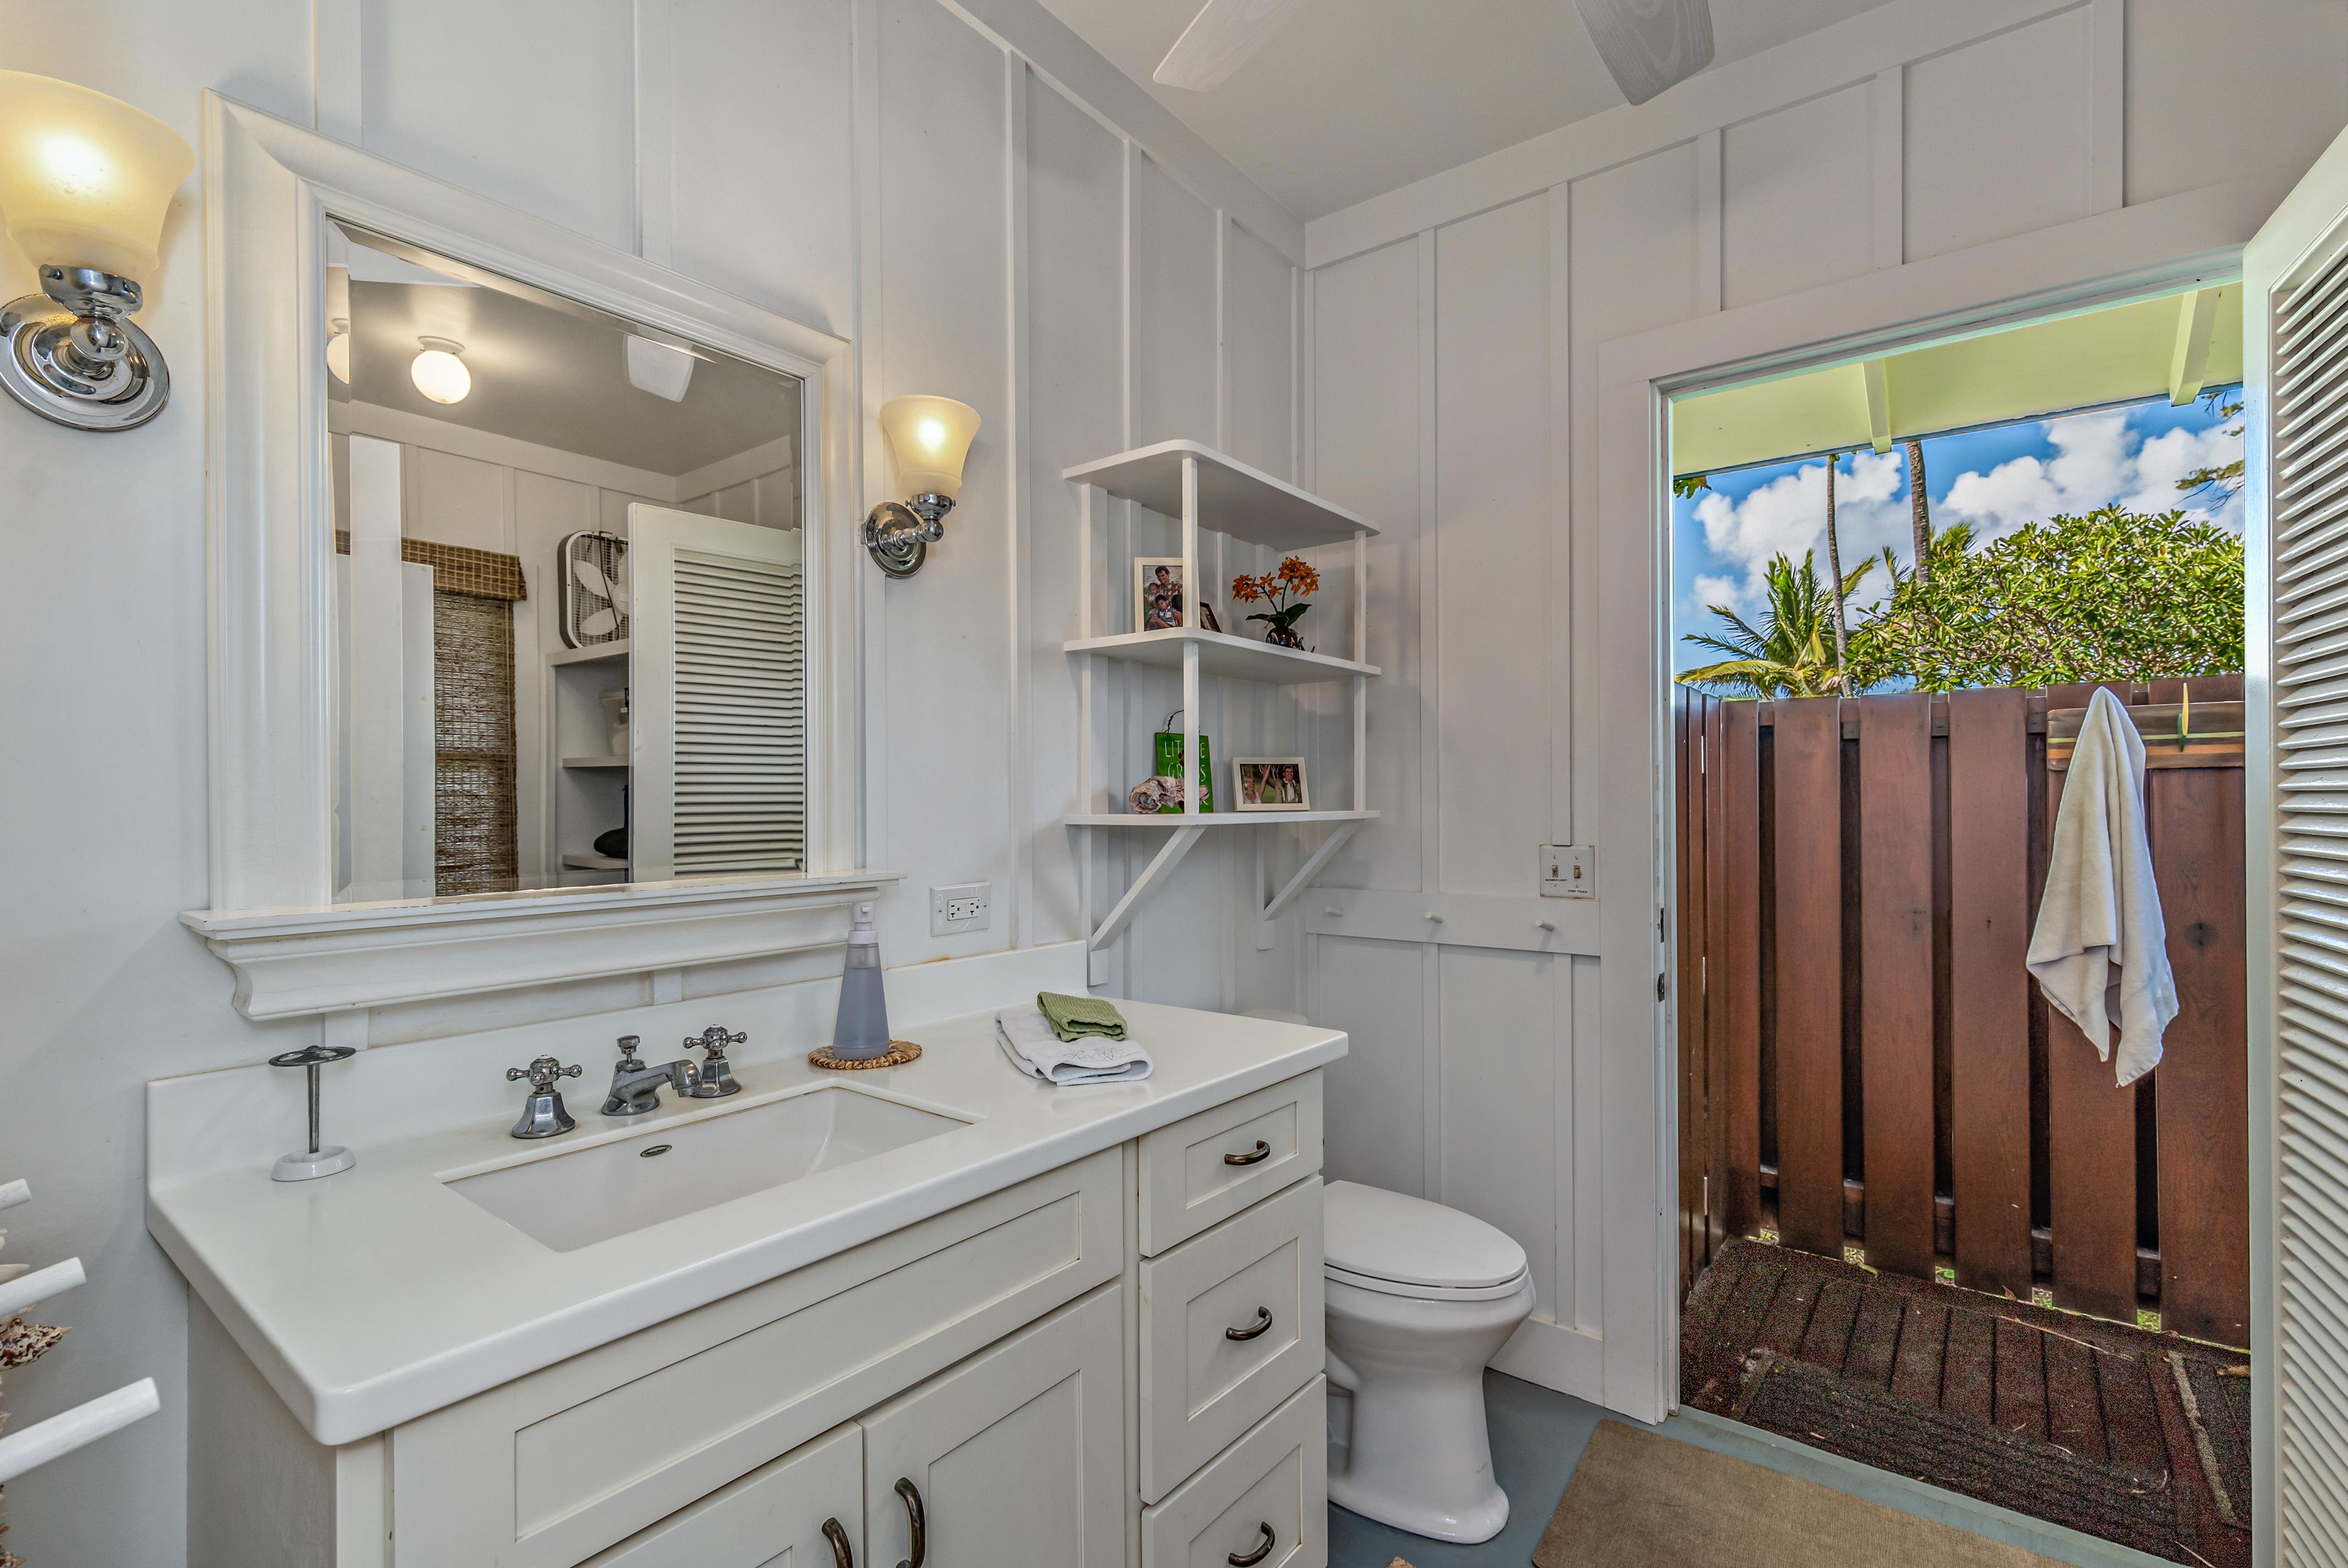 Hawaii Vacation Rental Home, Outdoor shower oahu